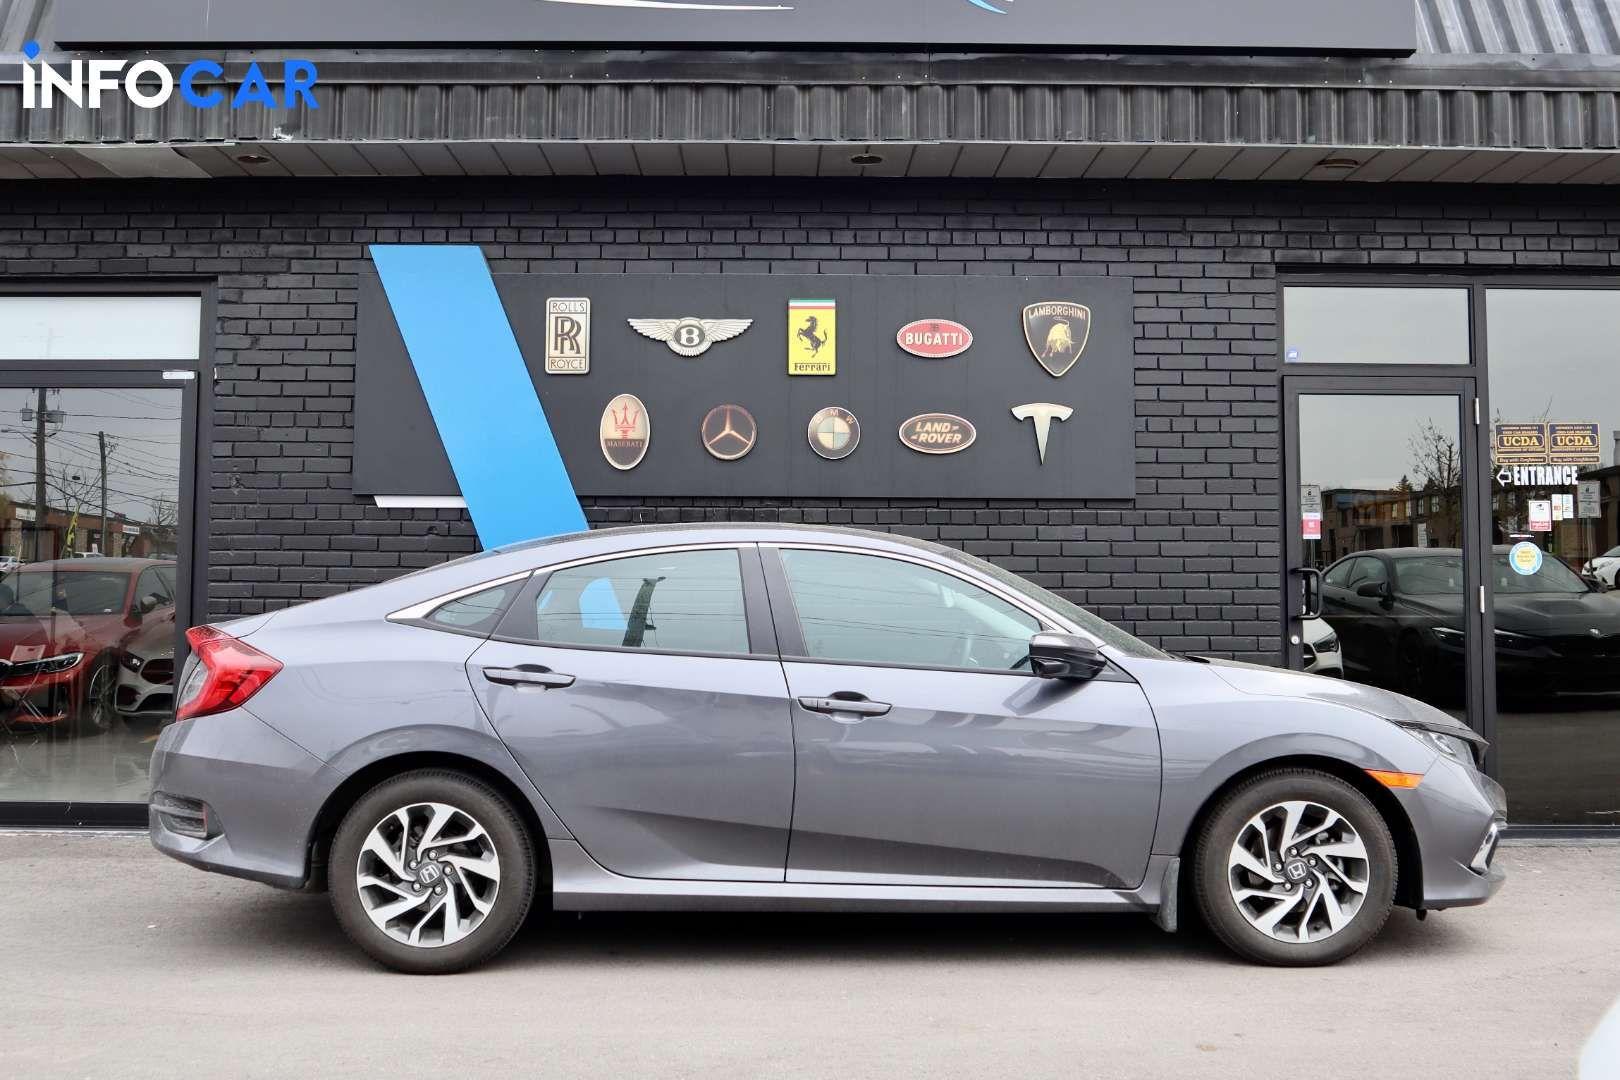 2019 Honda Civic EX - INFOCAR - Toronto's Most Comprehensive New and Used Auto Trading Platform